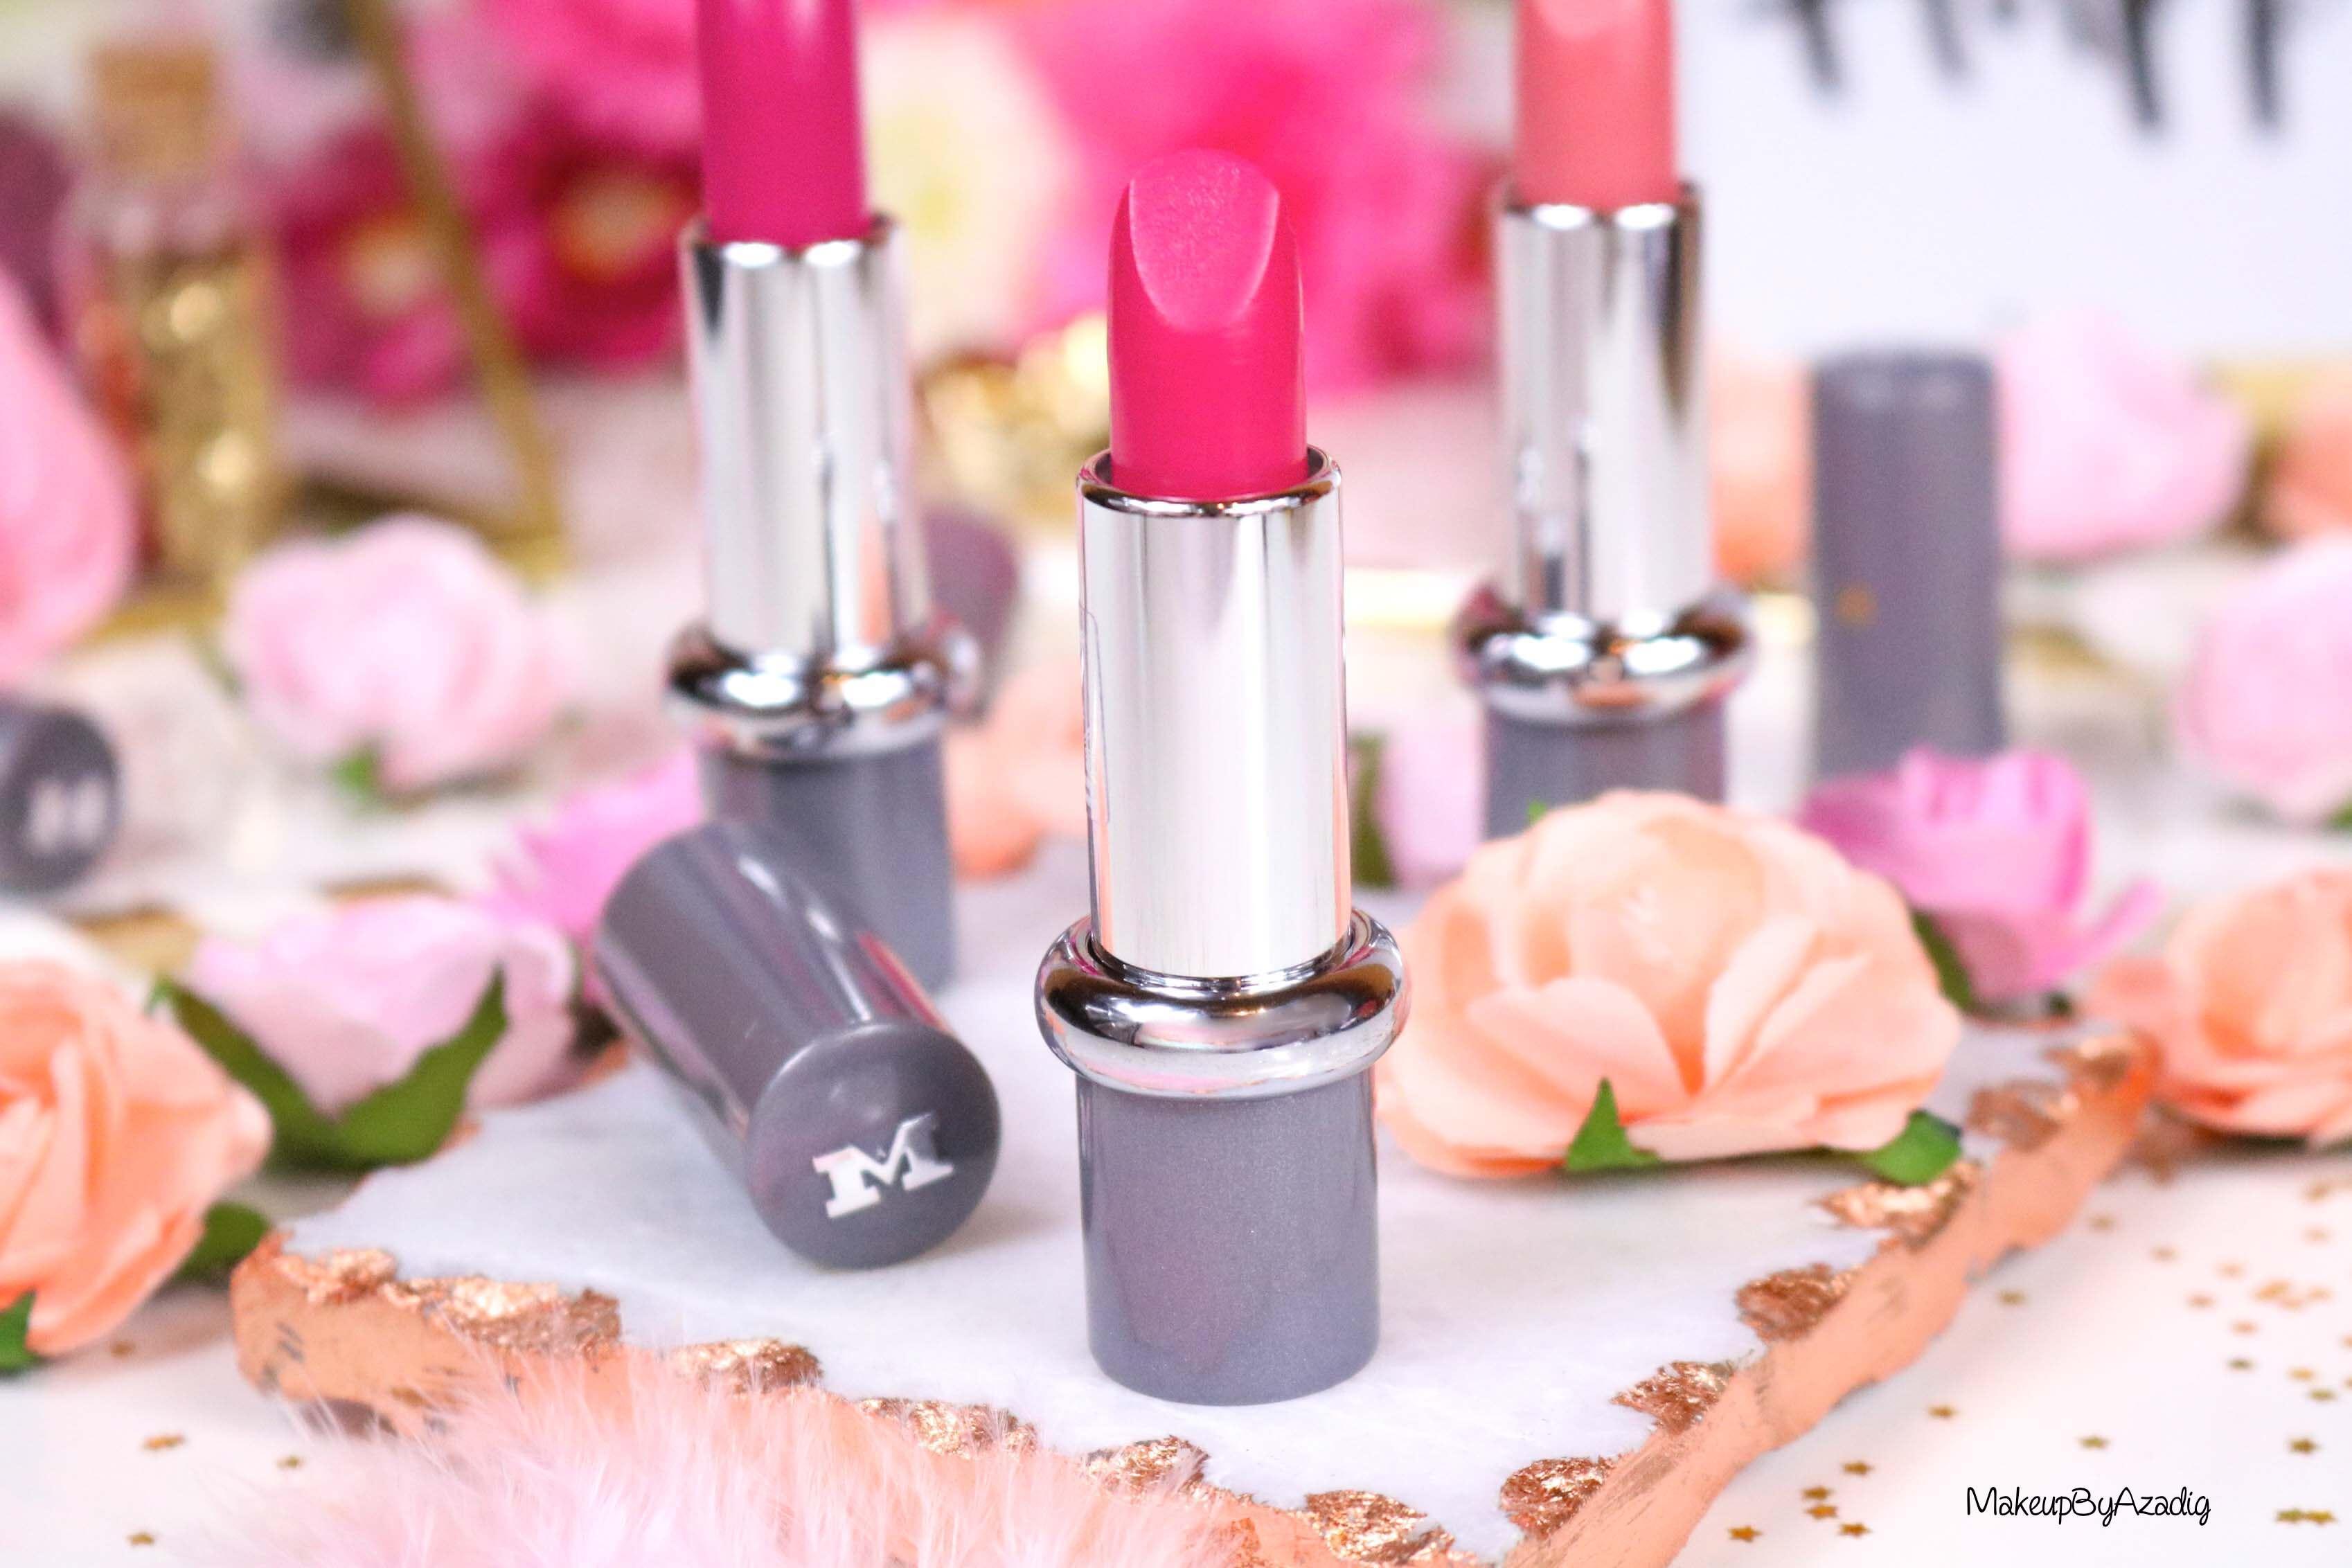 revue-rouge-levres-mavala-soin-monoprix-collection-printemps-ete-rose-nude-violet-avis-prix-makeupbyazadig-anemone